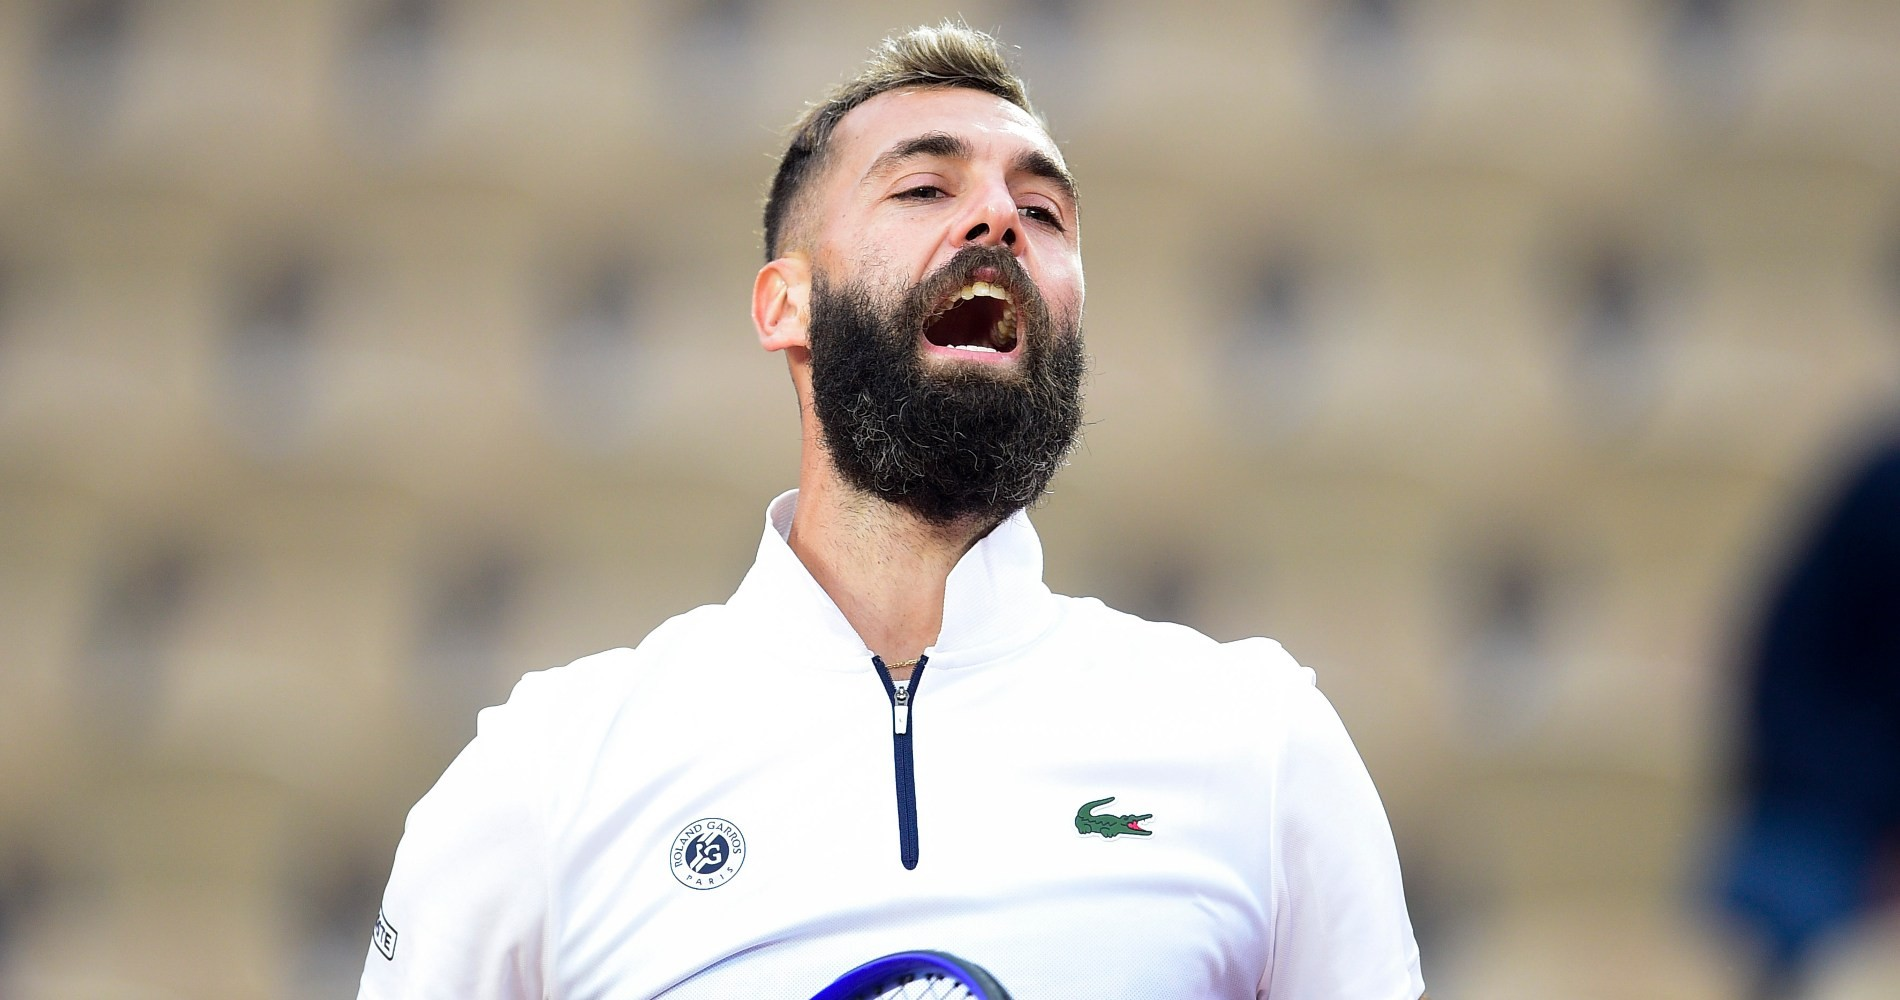 Benoît Paire, Roland-Garros, 2020